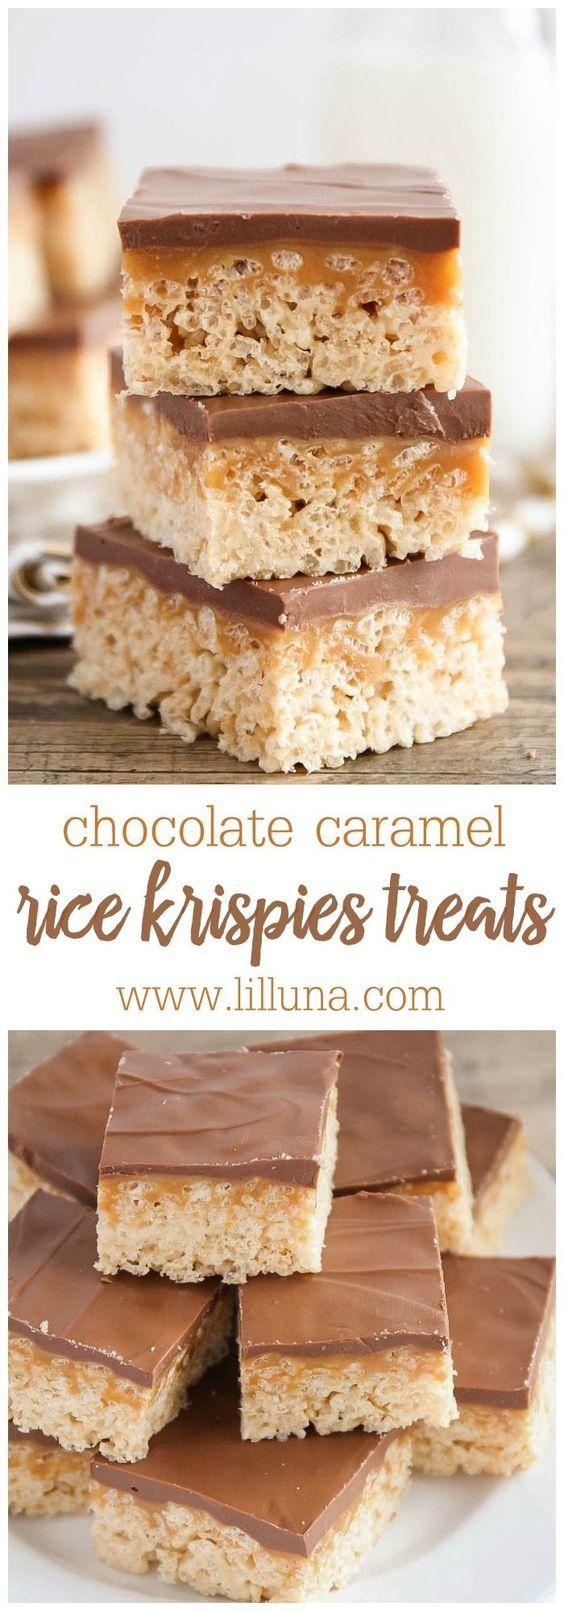 Chocolate Caramel Peanut Butter Rice Krispies Treat ...